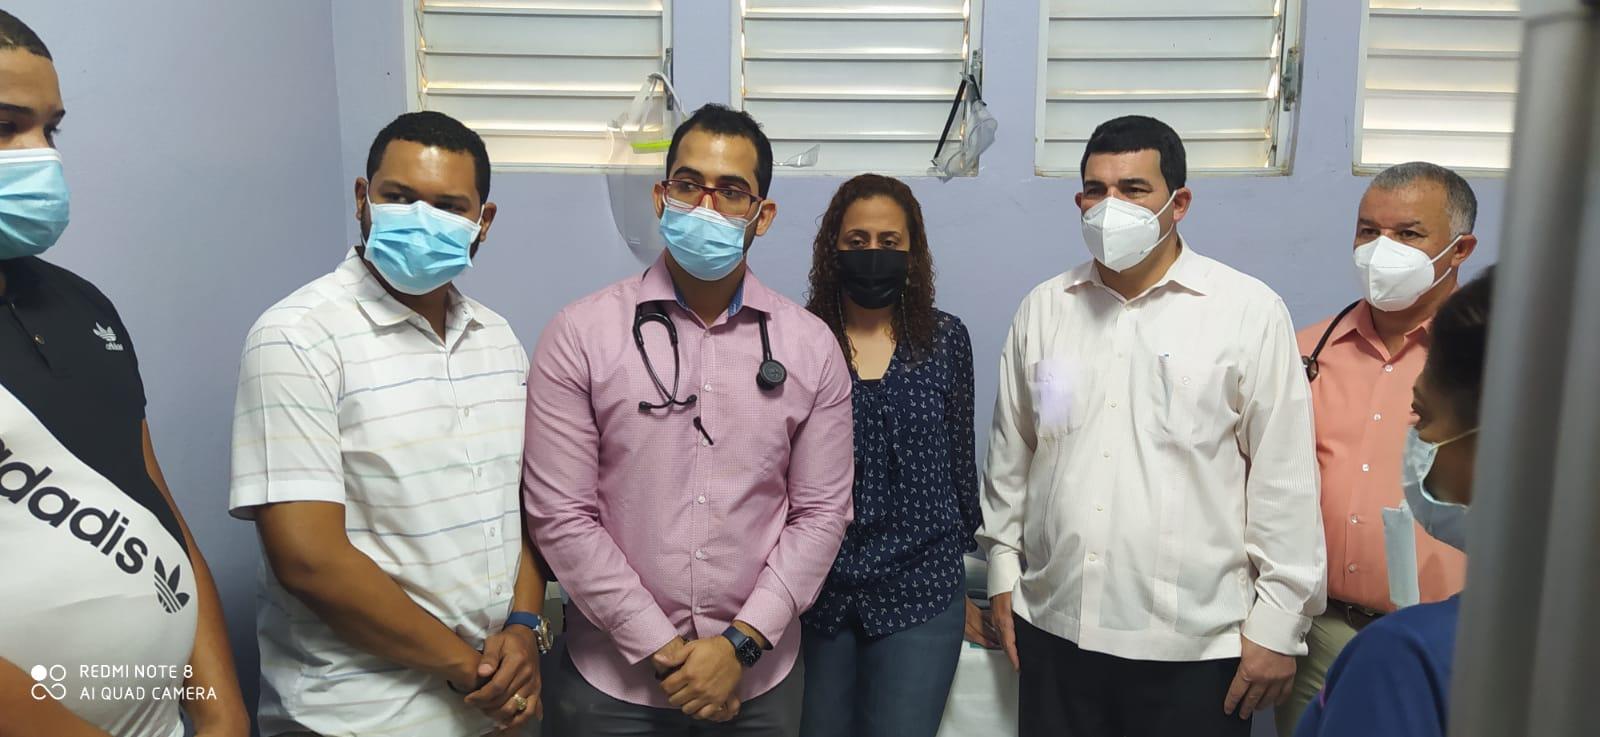 SRSCO, Entrega  sonógrafo al hospital Julio Moronta de Laguna Salada.